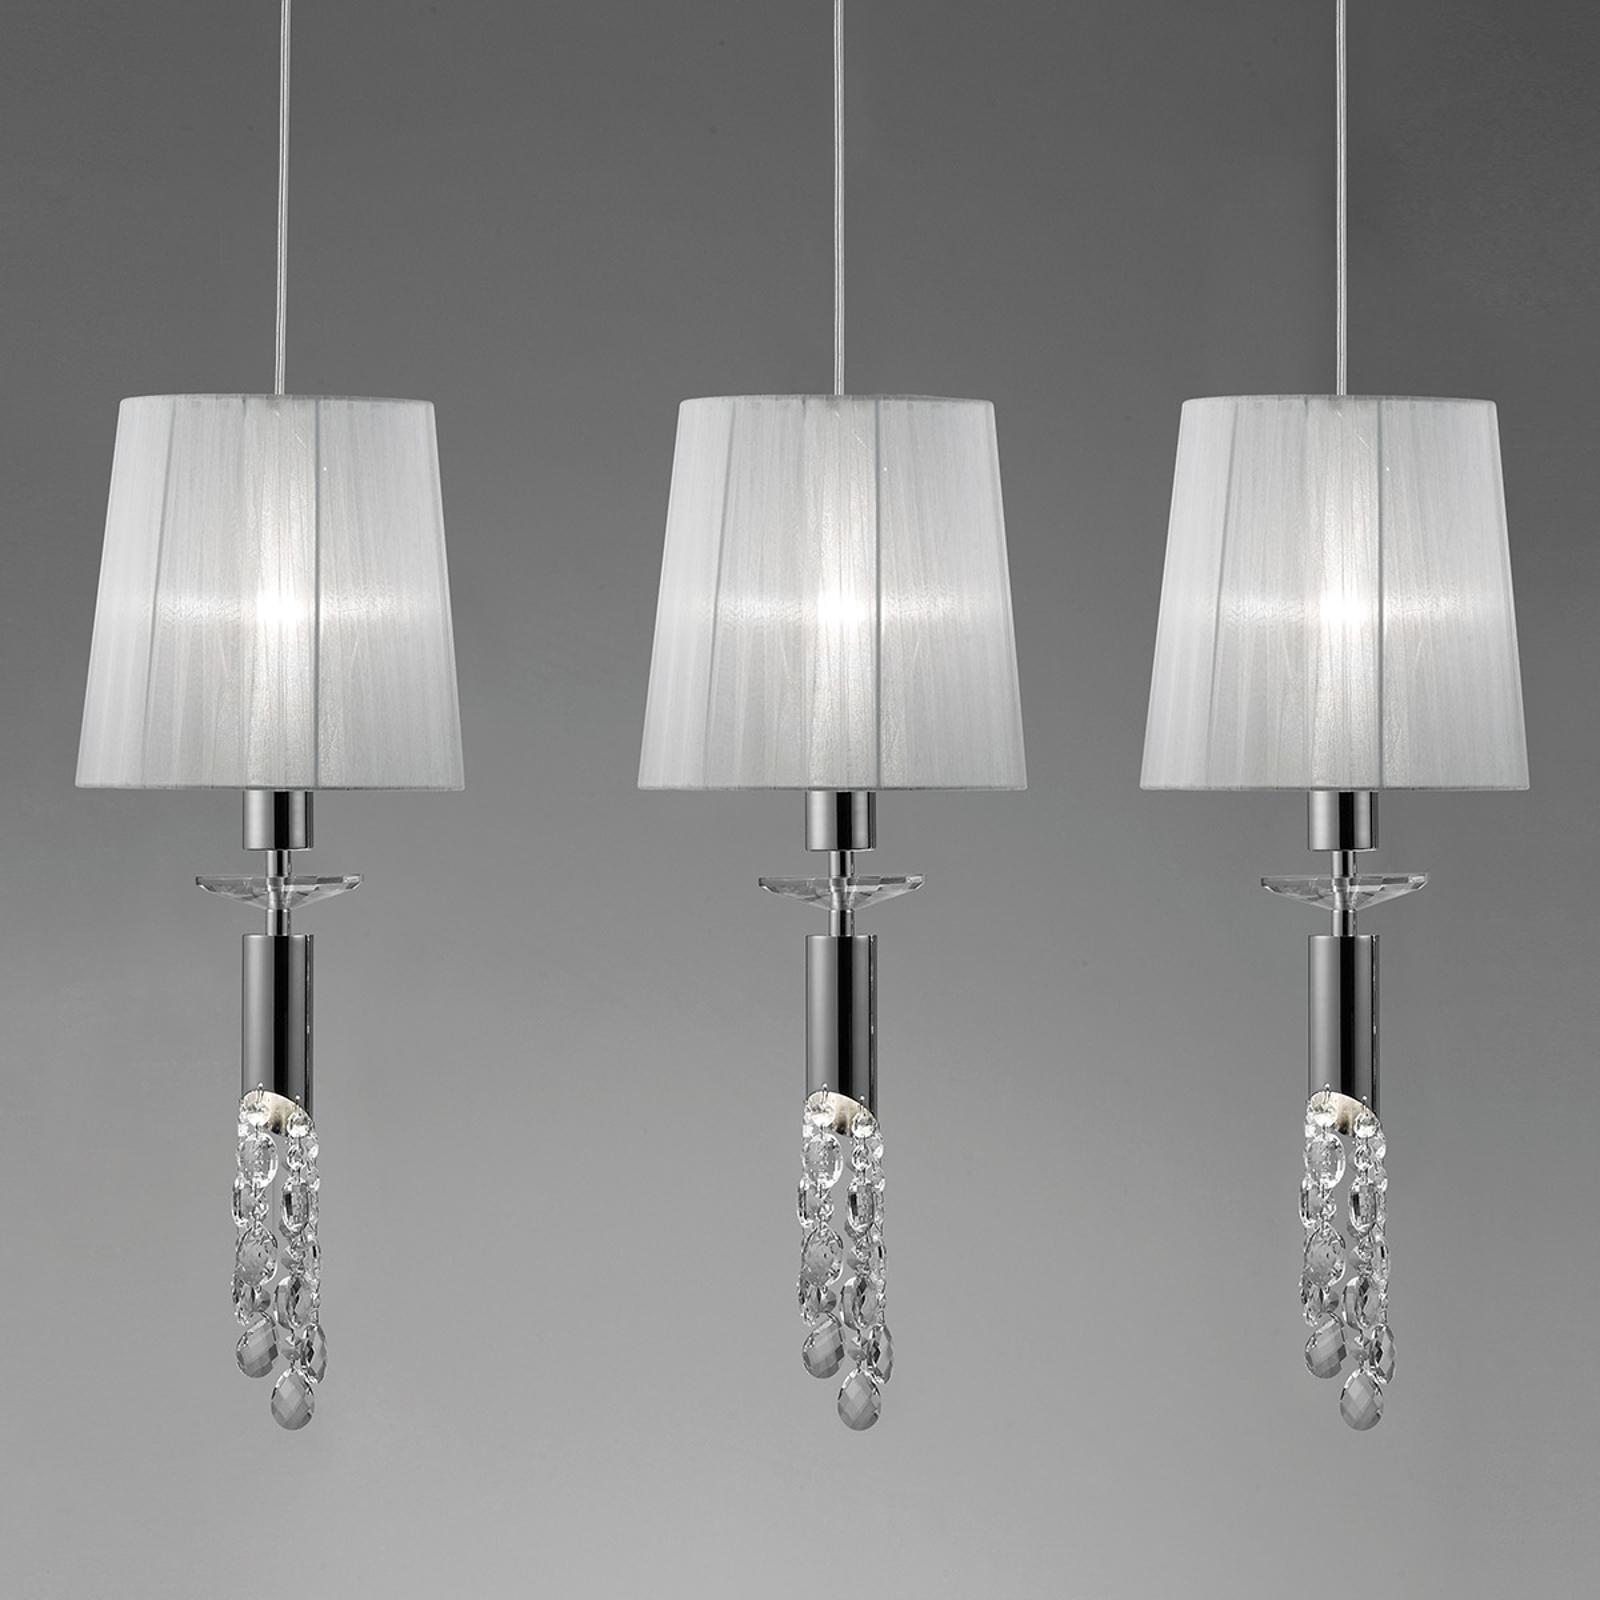 Suspension originale Lilja en cristal, à 3 lampes